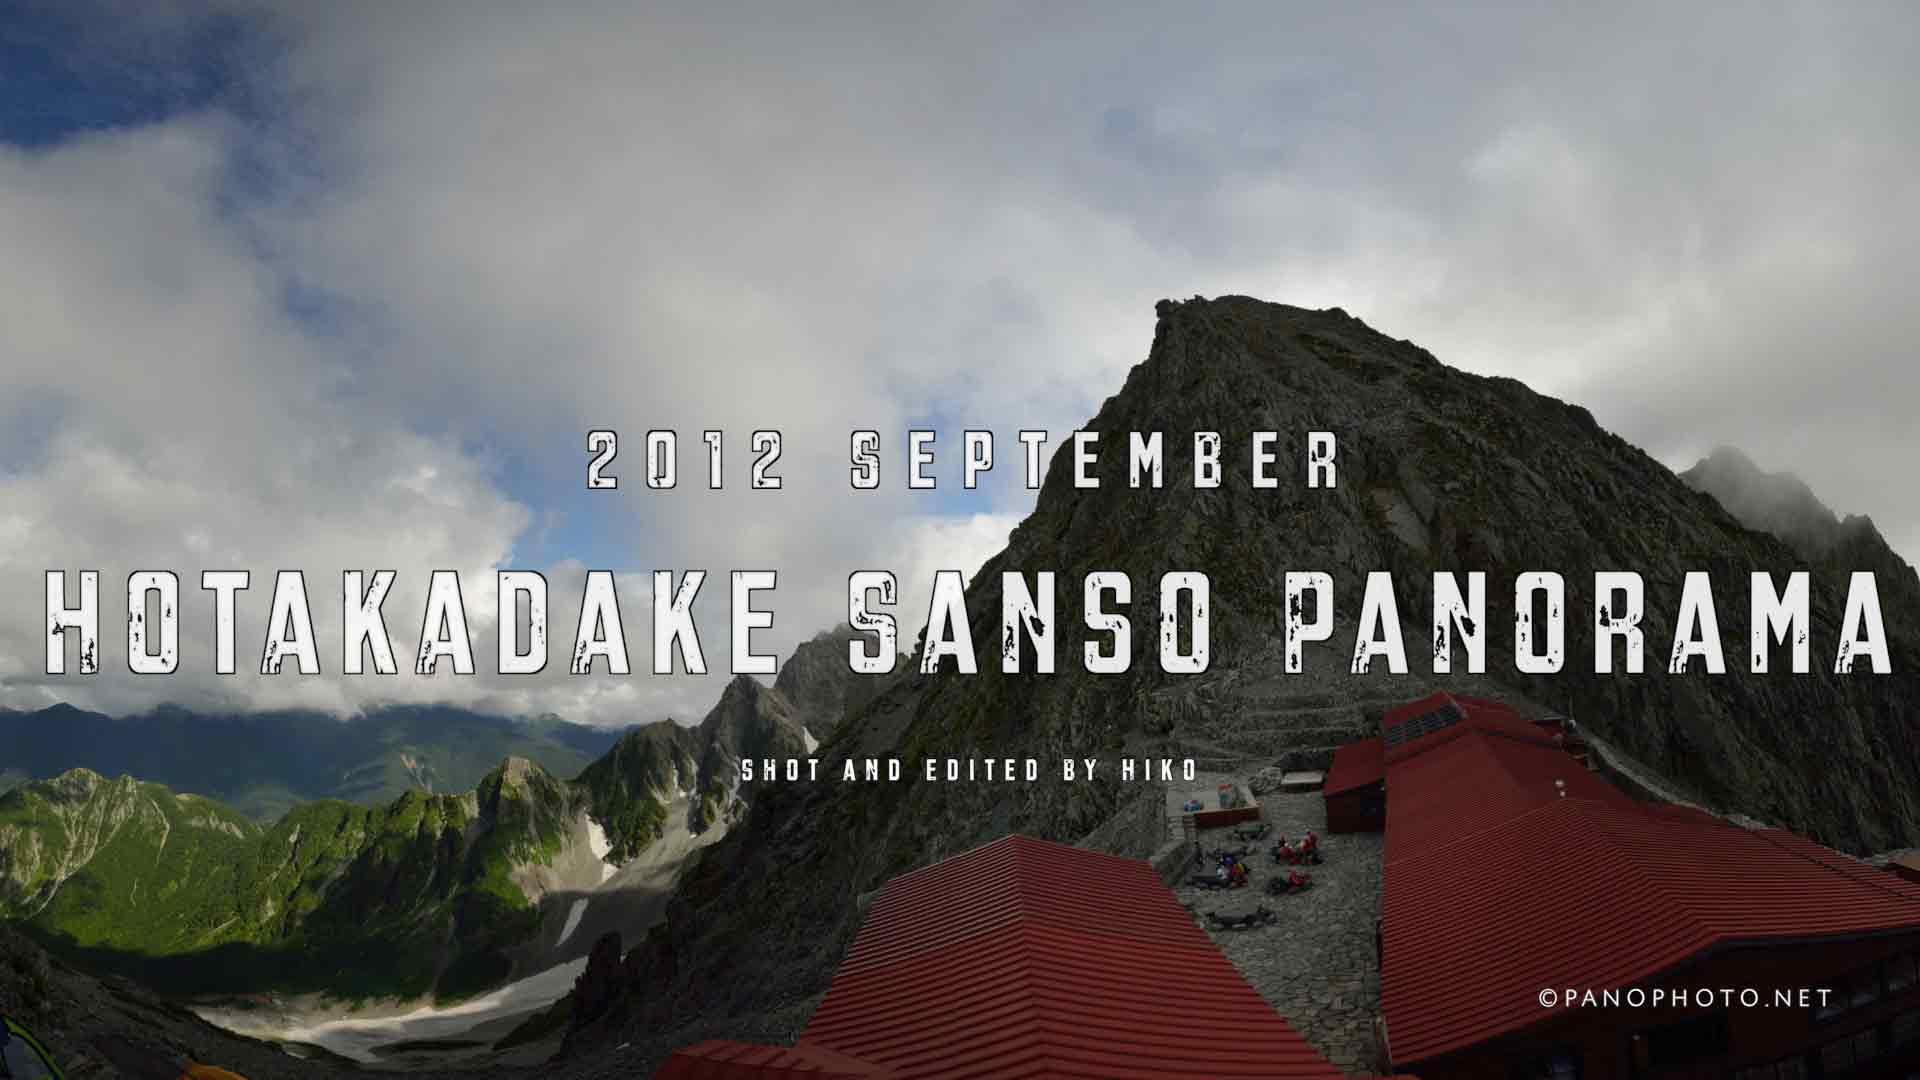 Hotakadake-Sanso-Panorama-Featured-Image